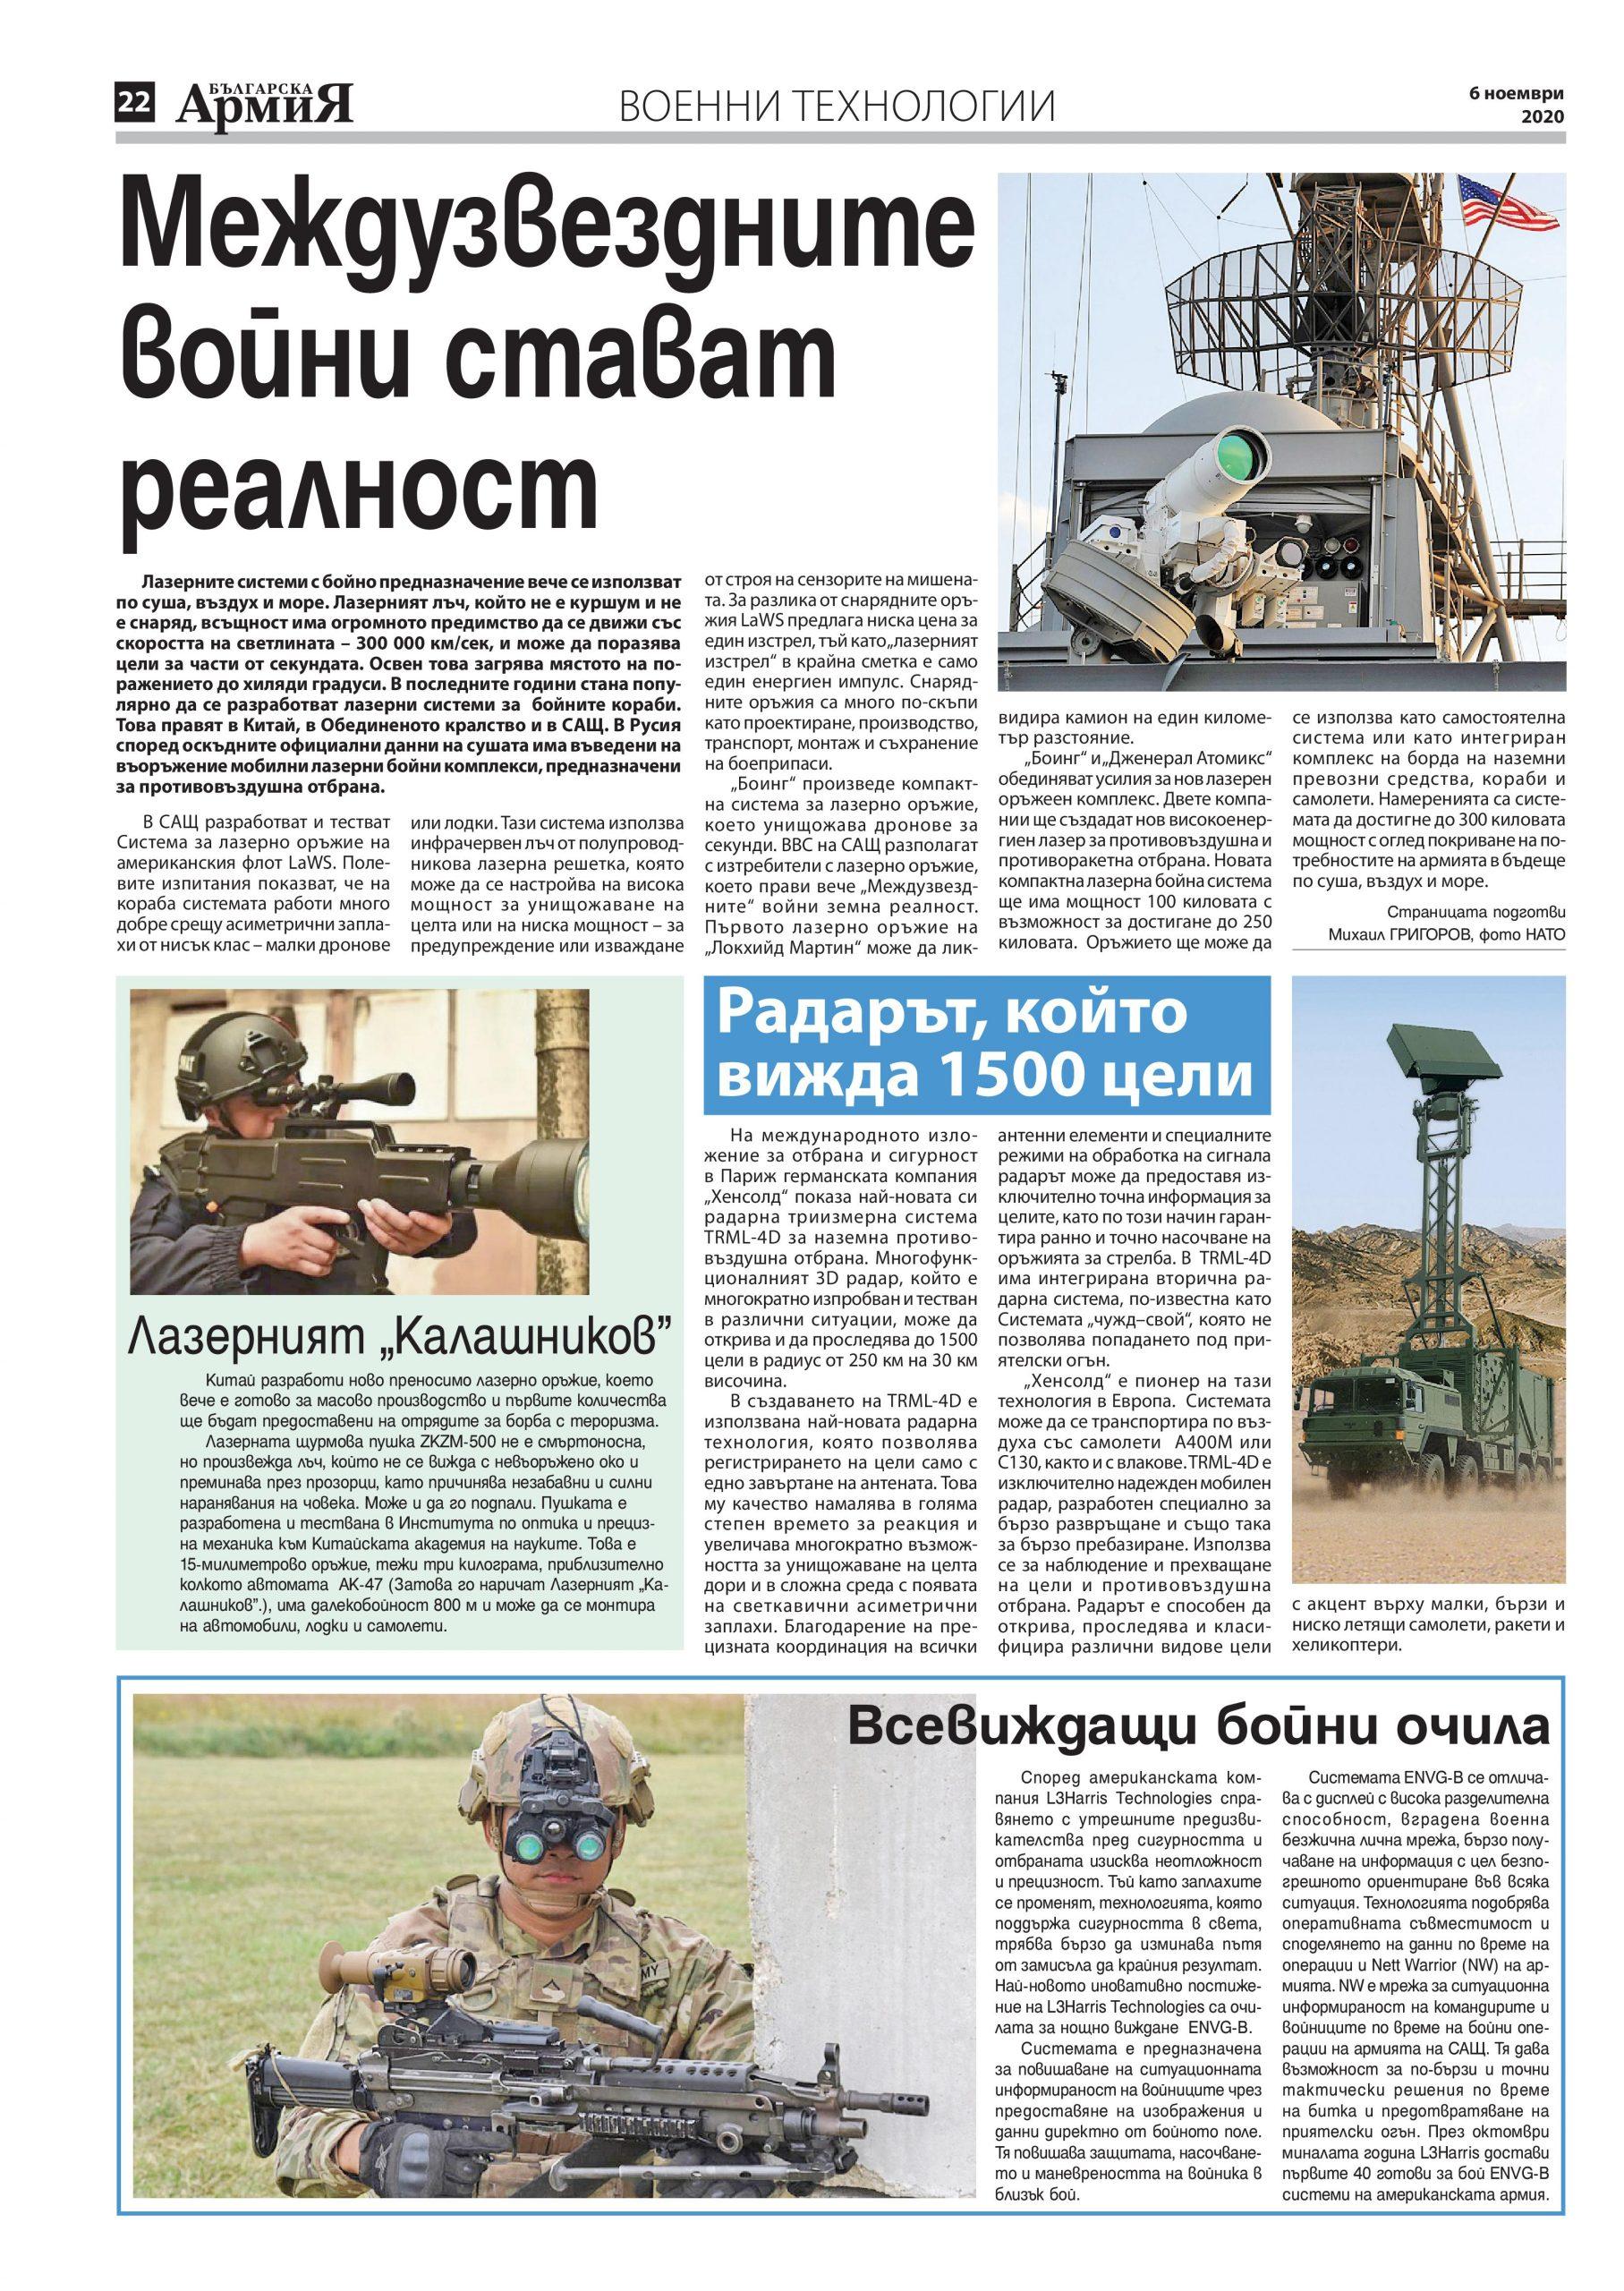 https://armymedia.bg/wp-content/uploads/2015/06/22-47-scaled.jpg